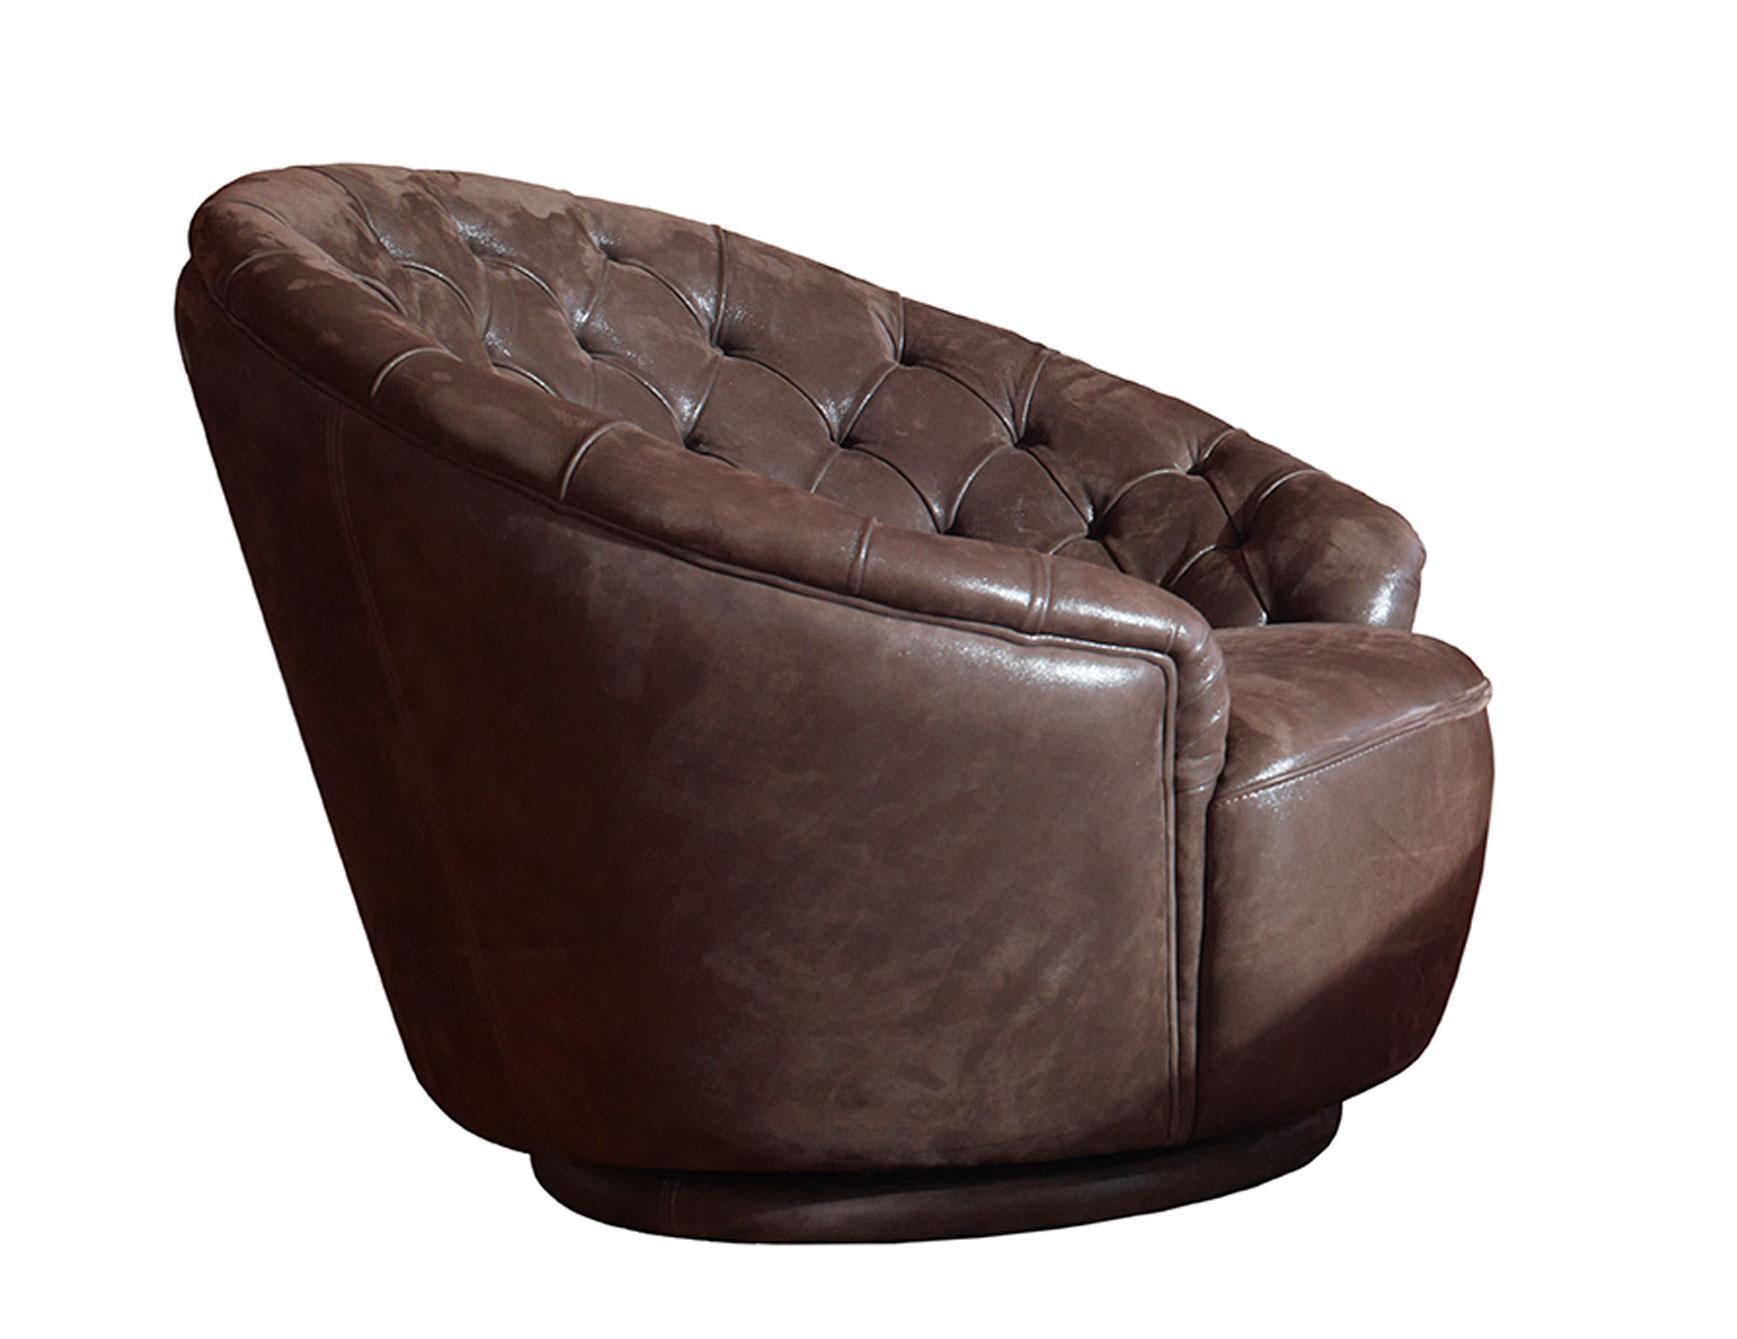 Italian Designer Luxury High End Sofas & Sofa Chairs: Nella Vetrina Pertaining To Sofa Chairs (Image 9 of 20)